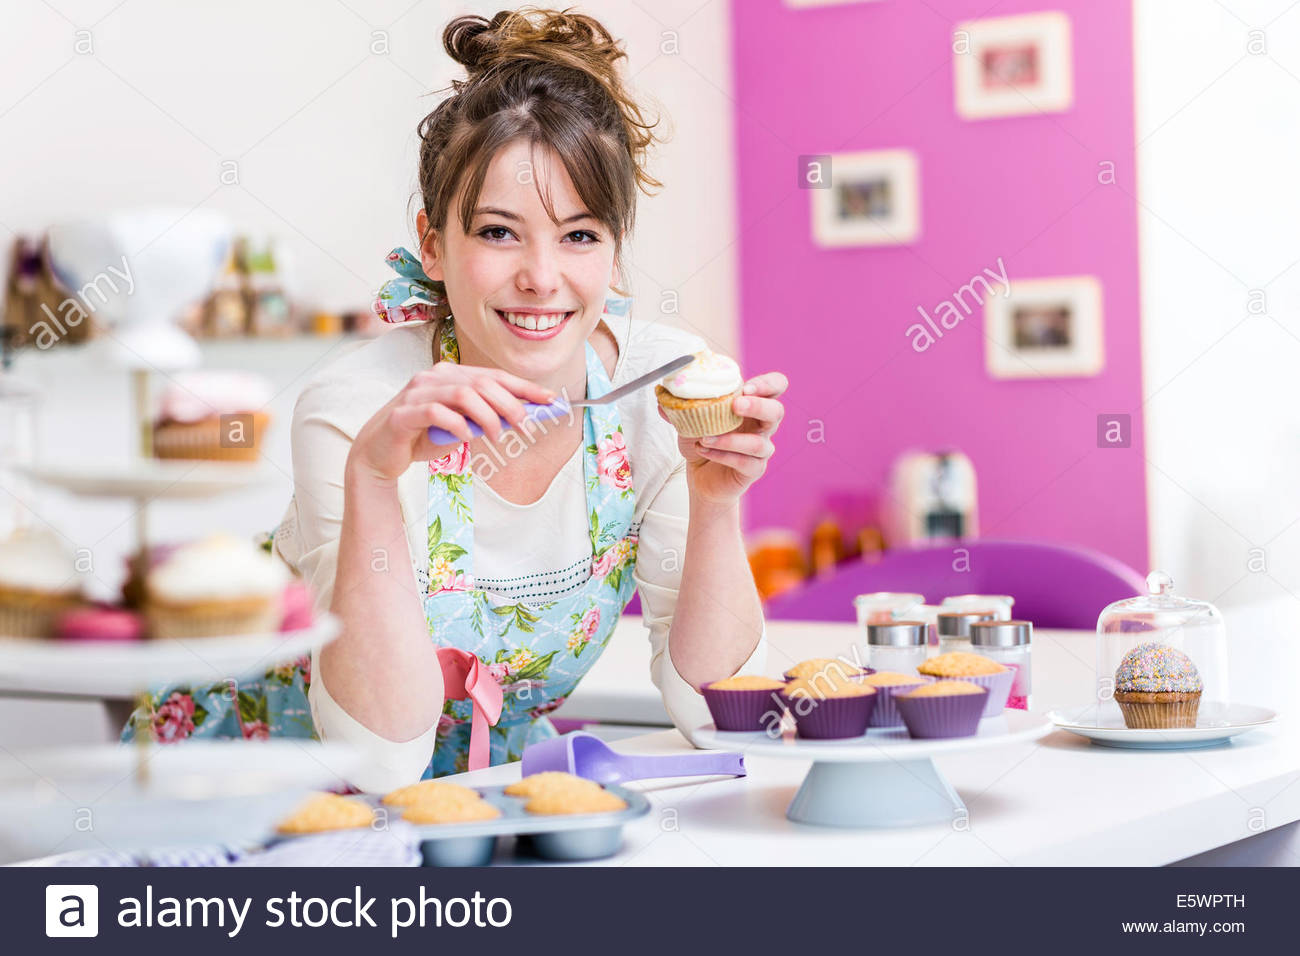 Woman decorating cupcake - Stock Image